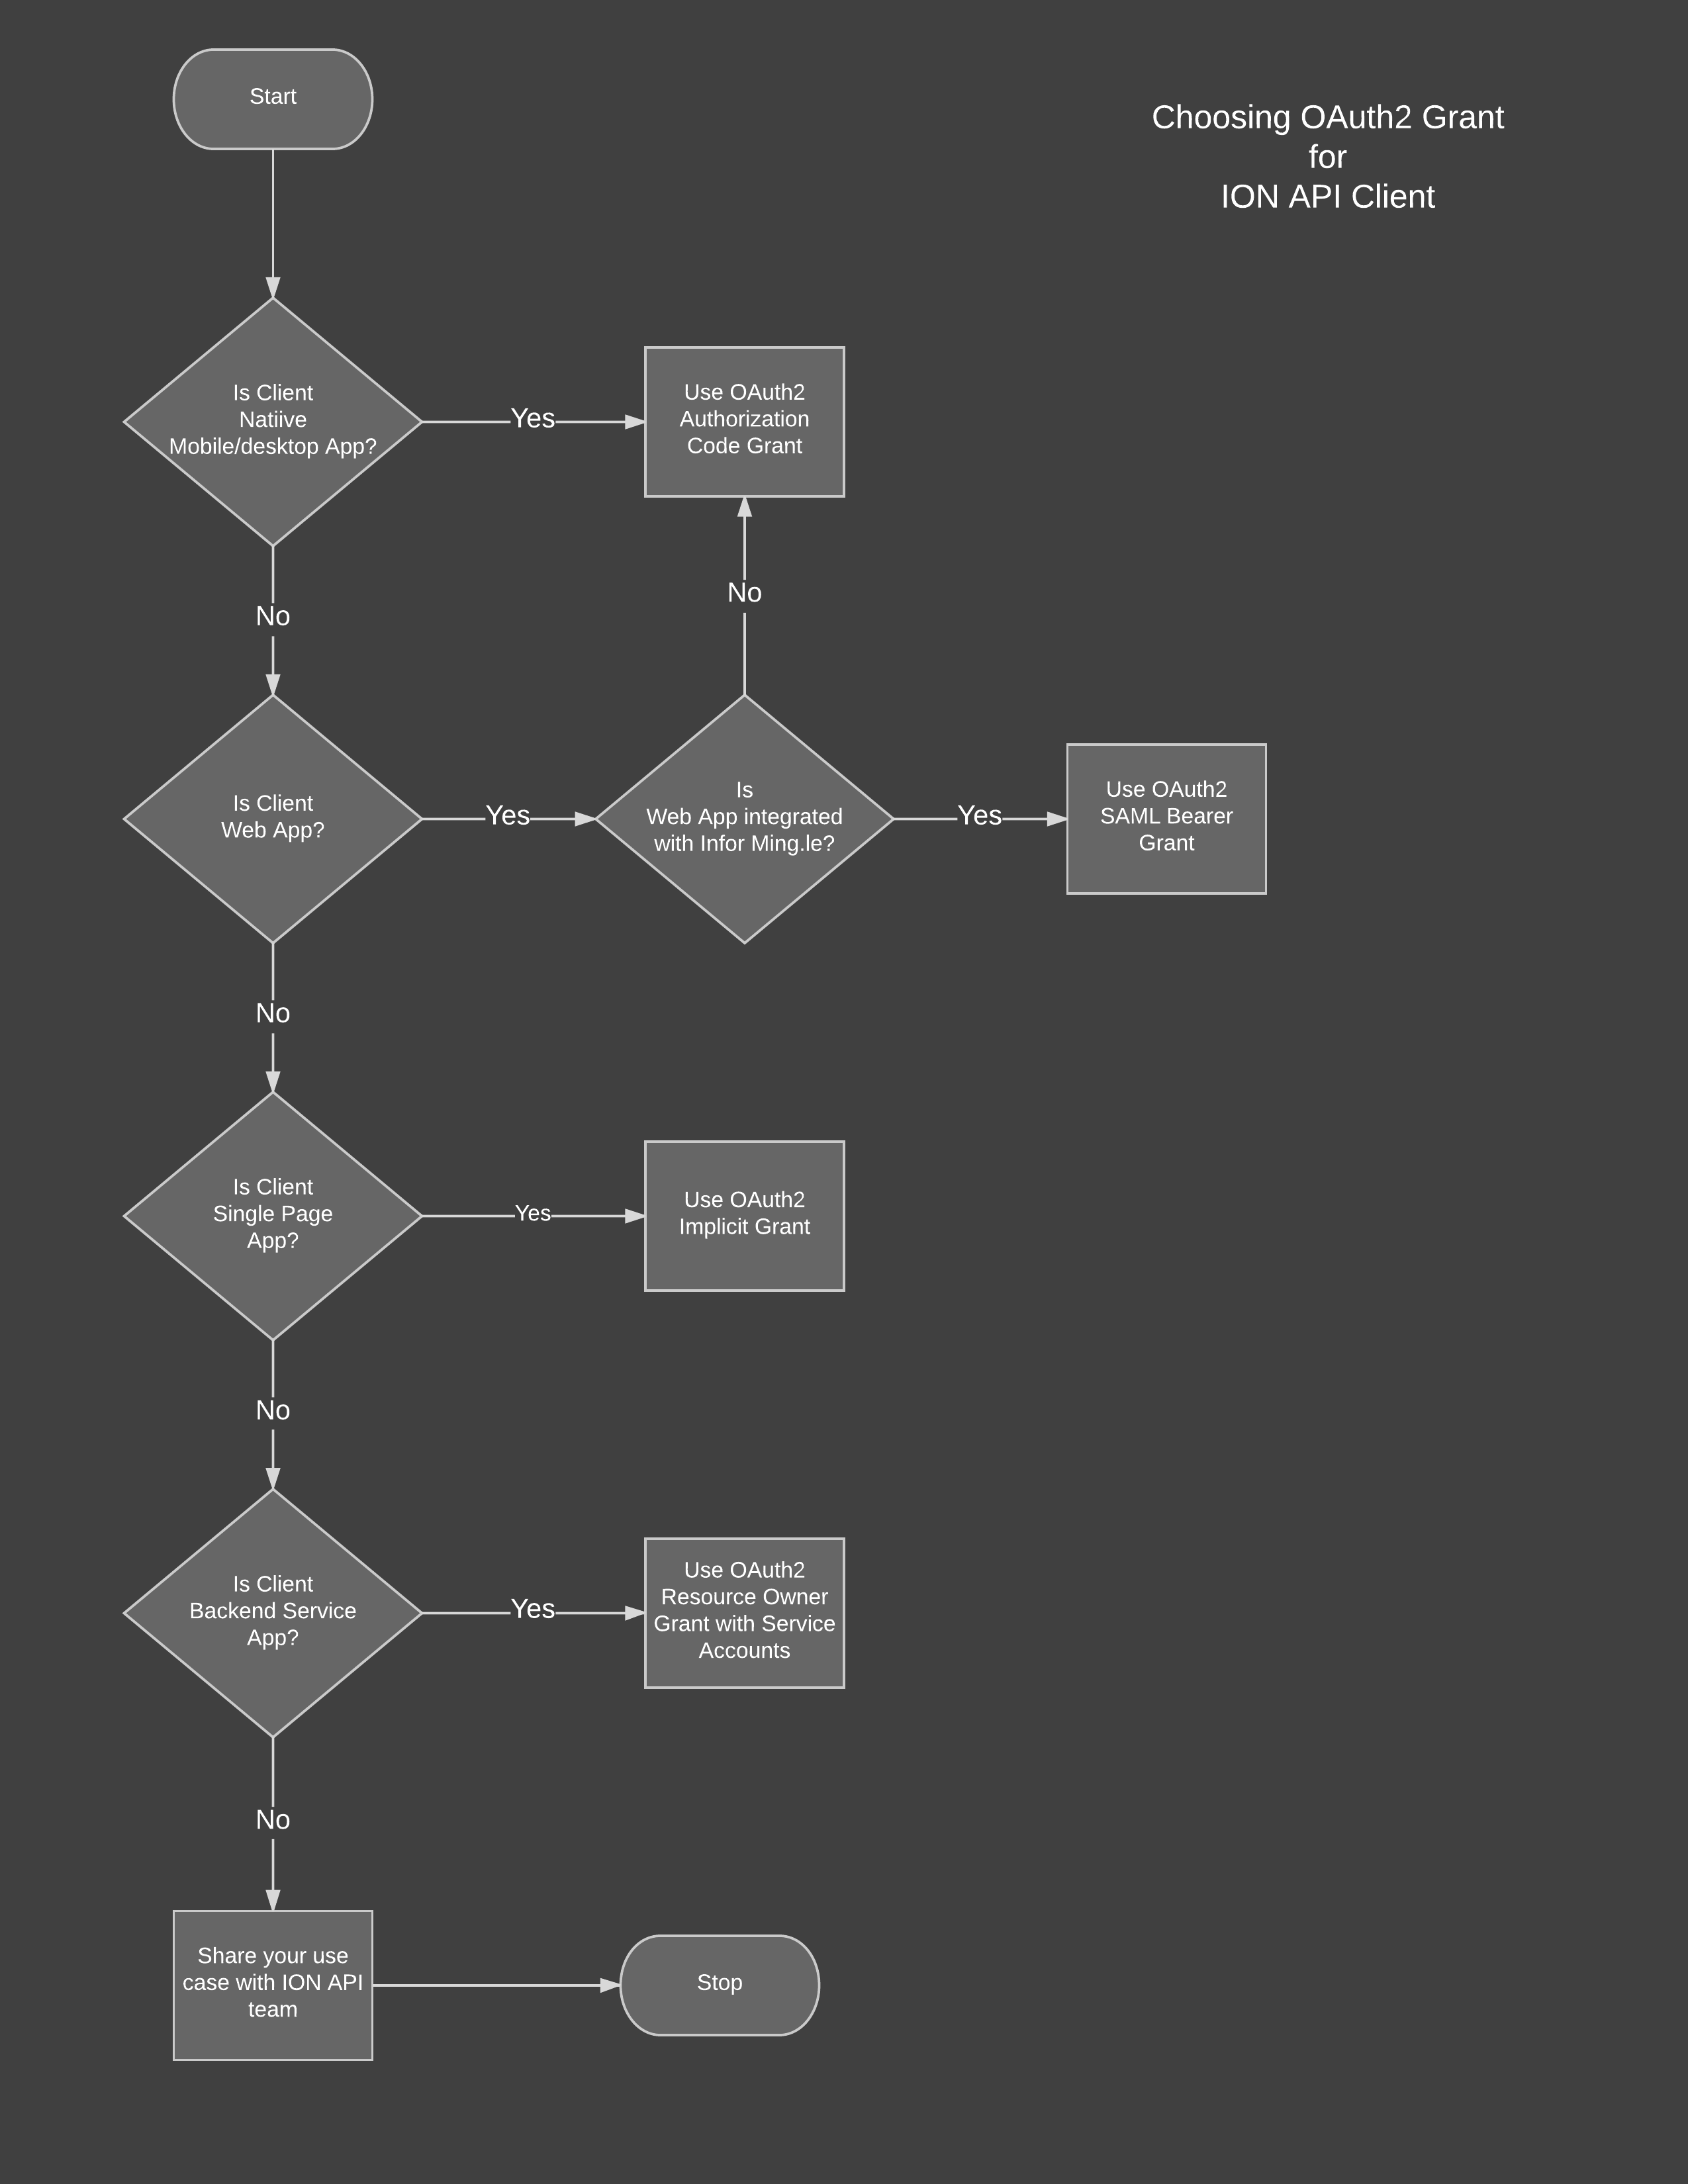 ion-api-sdk/README md at master · infor-cloud/ion-api-sdk · GitHub